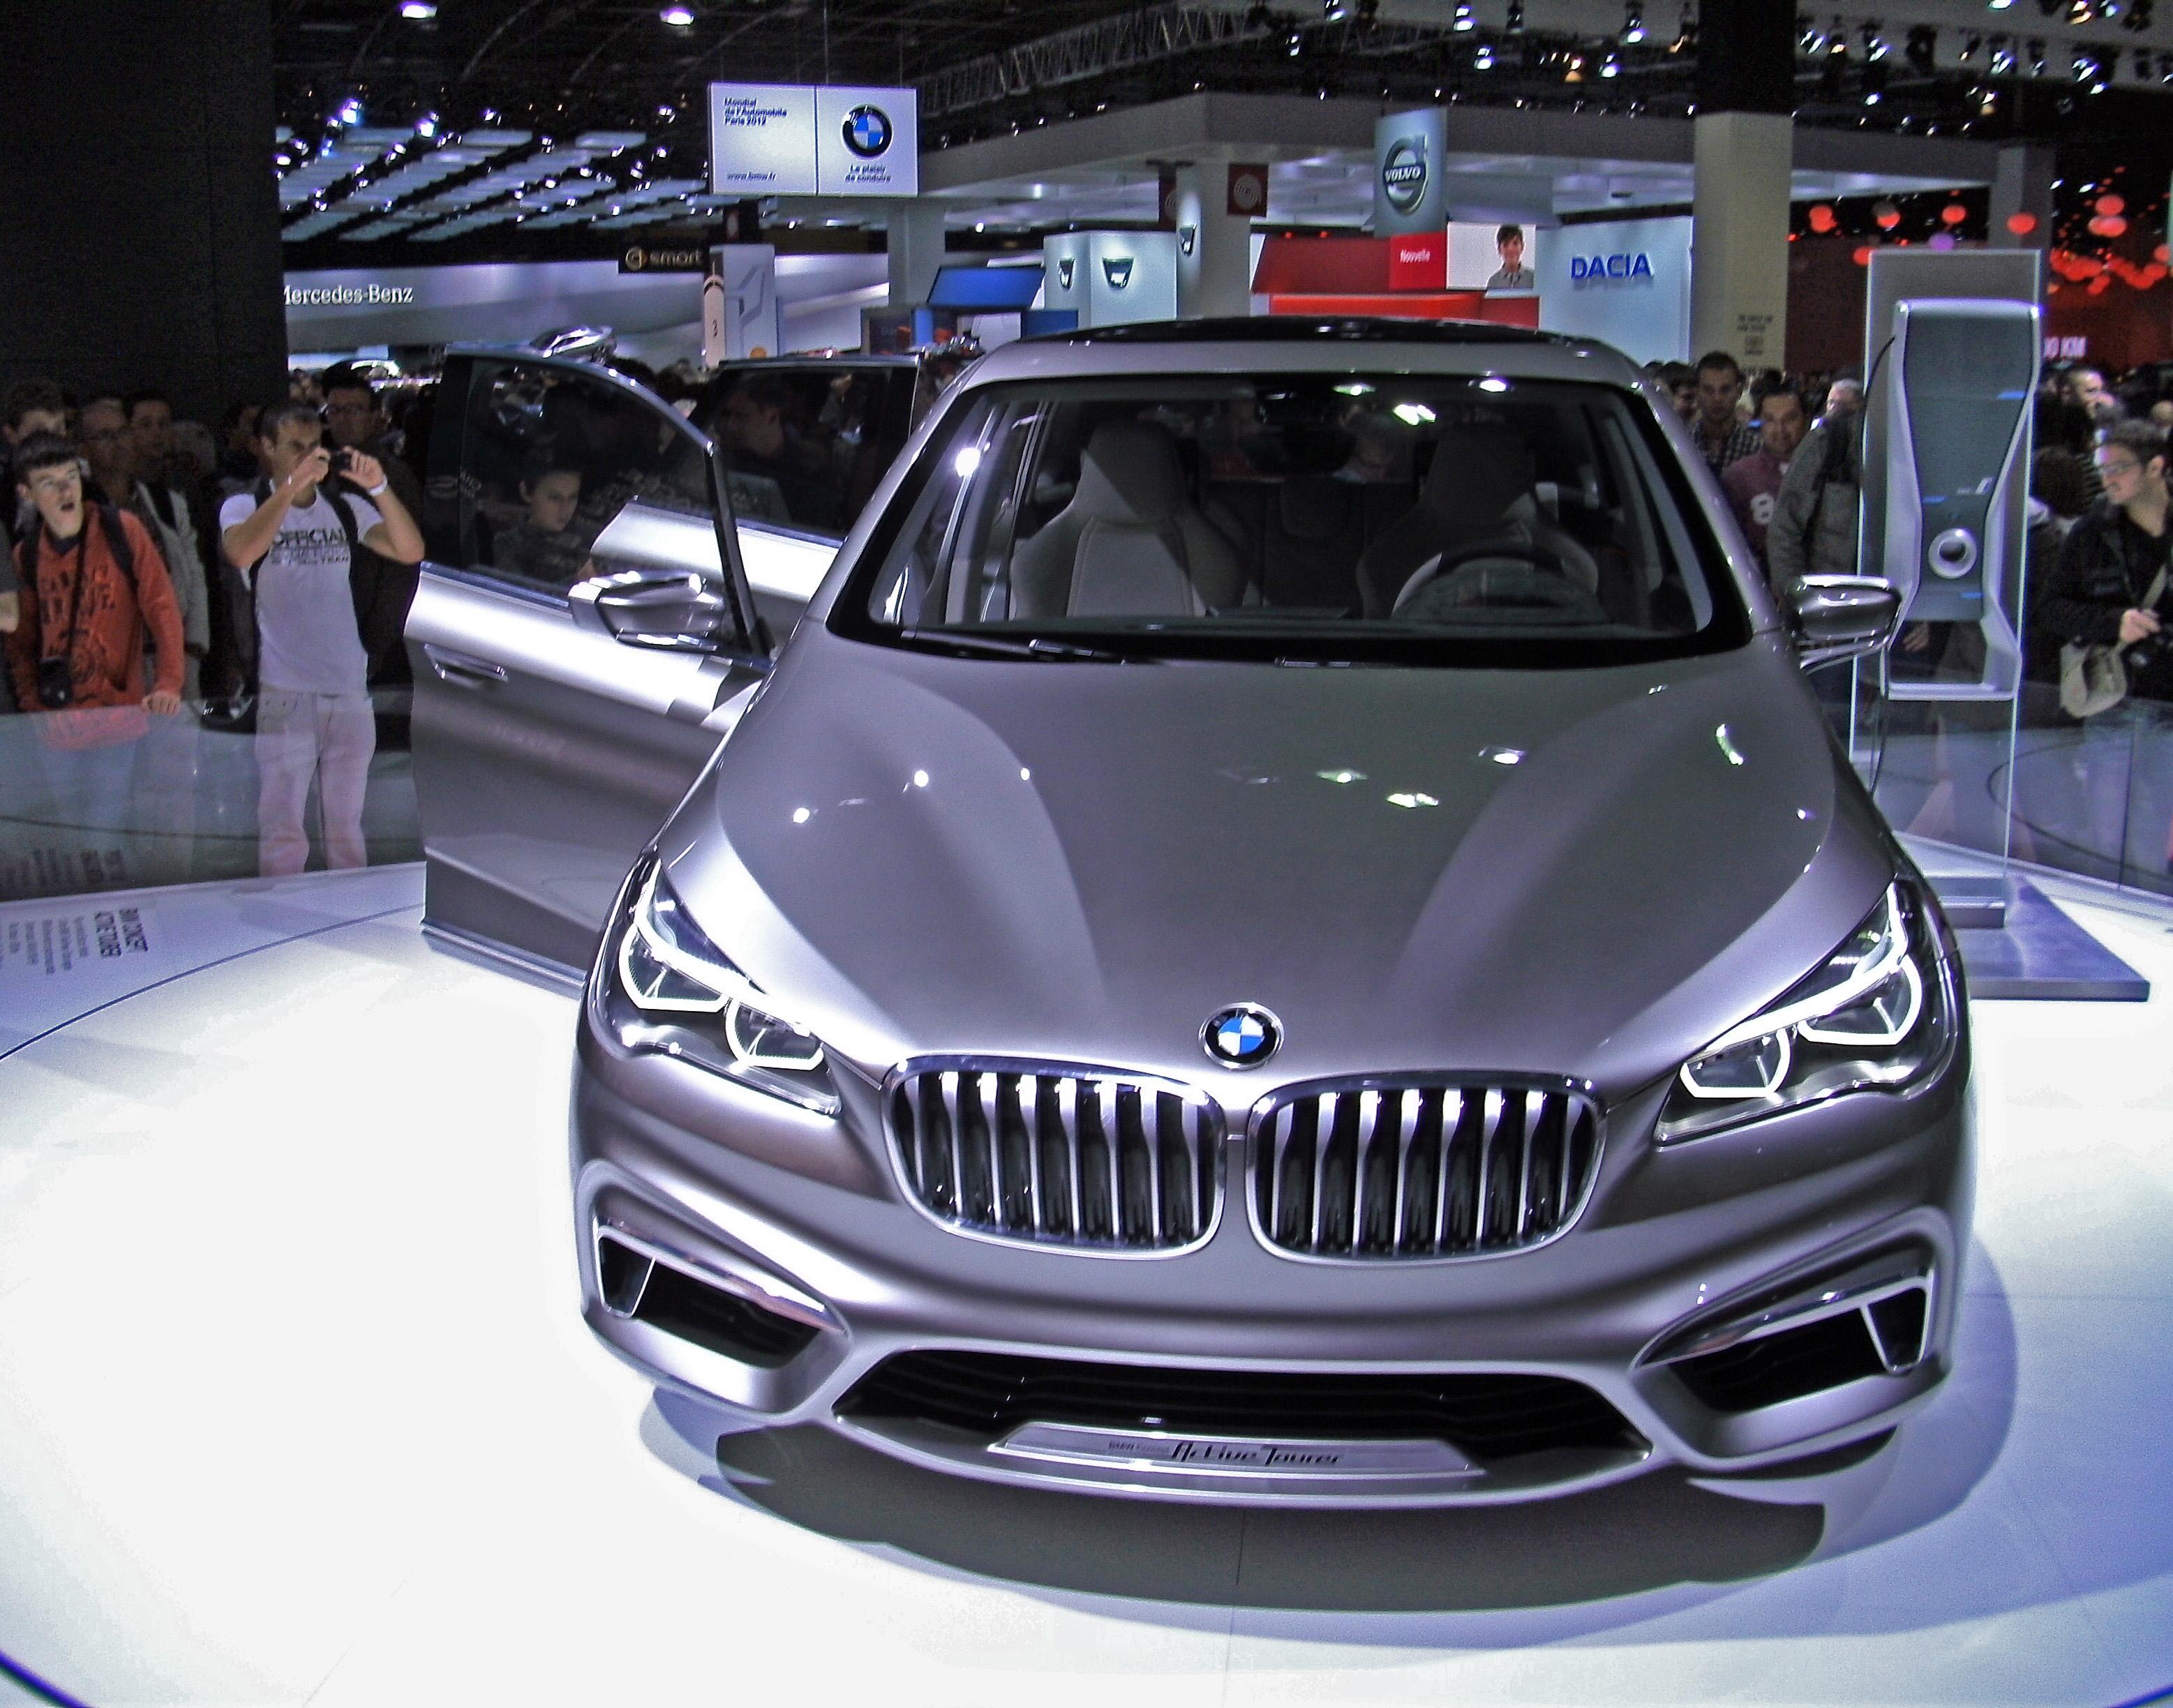 File:BMW Concept Active Tourer Paris Motor Show 2012.JPG - Wikimedia ...